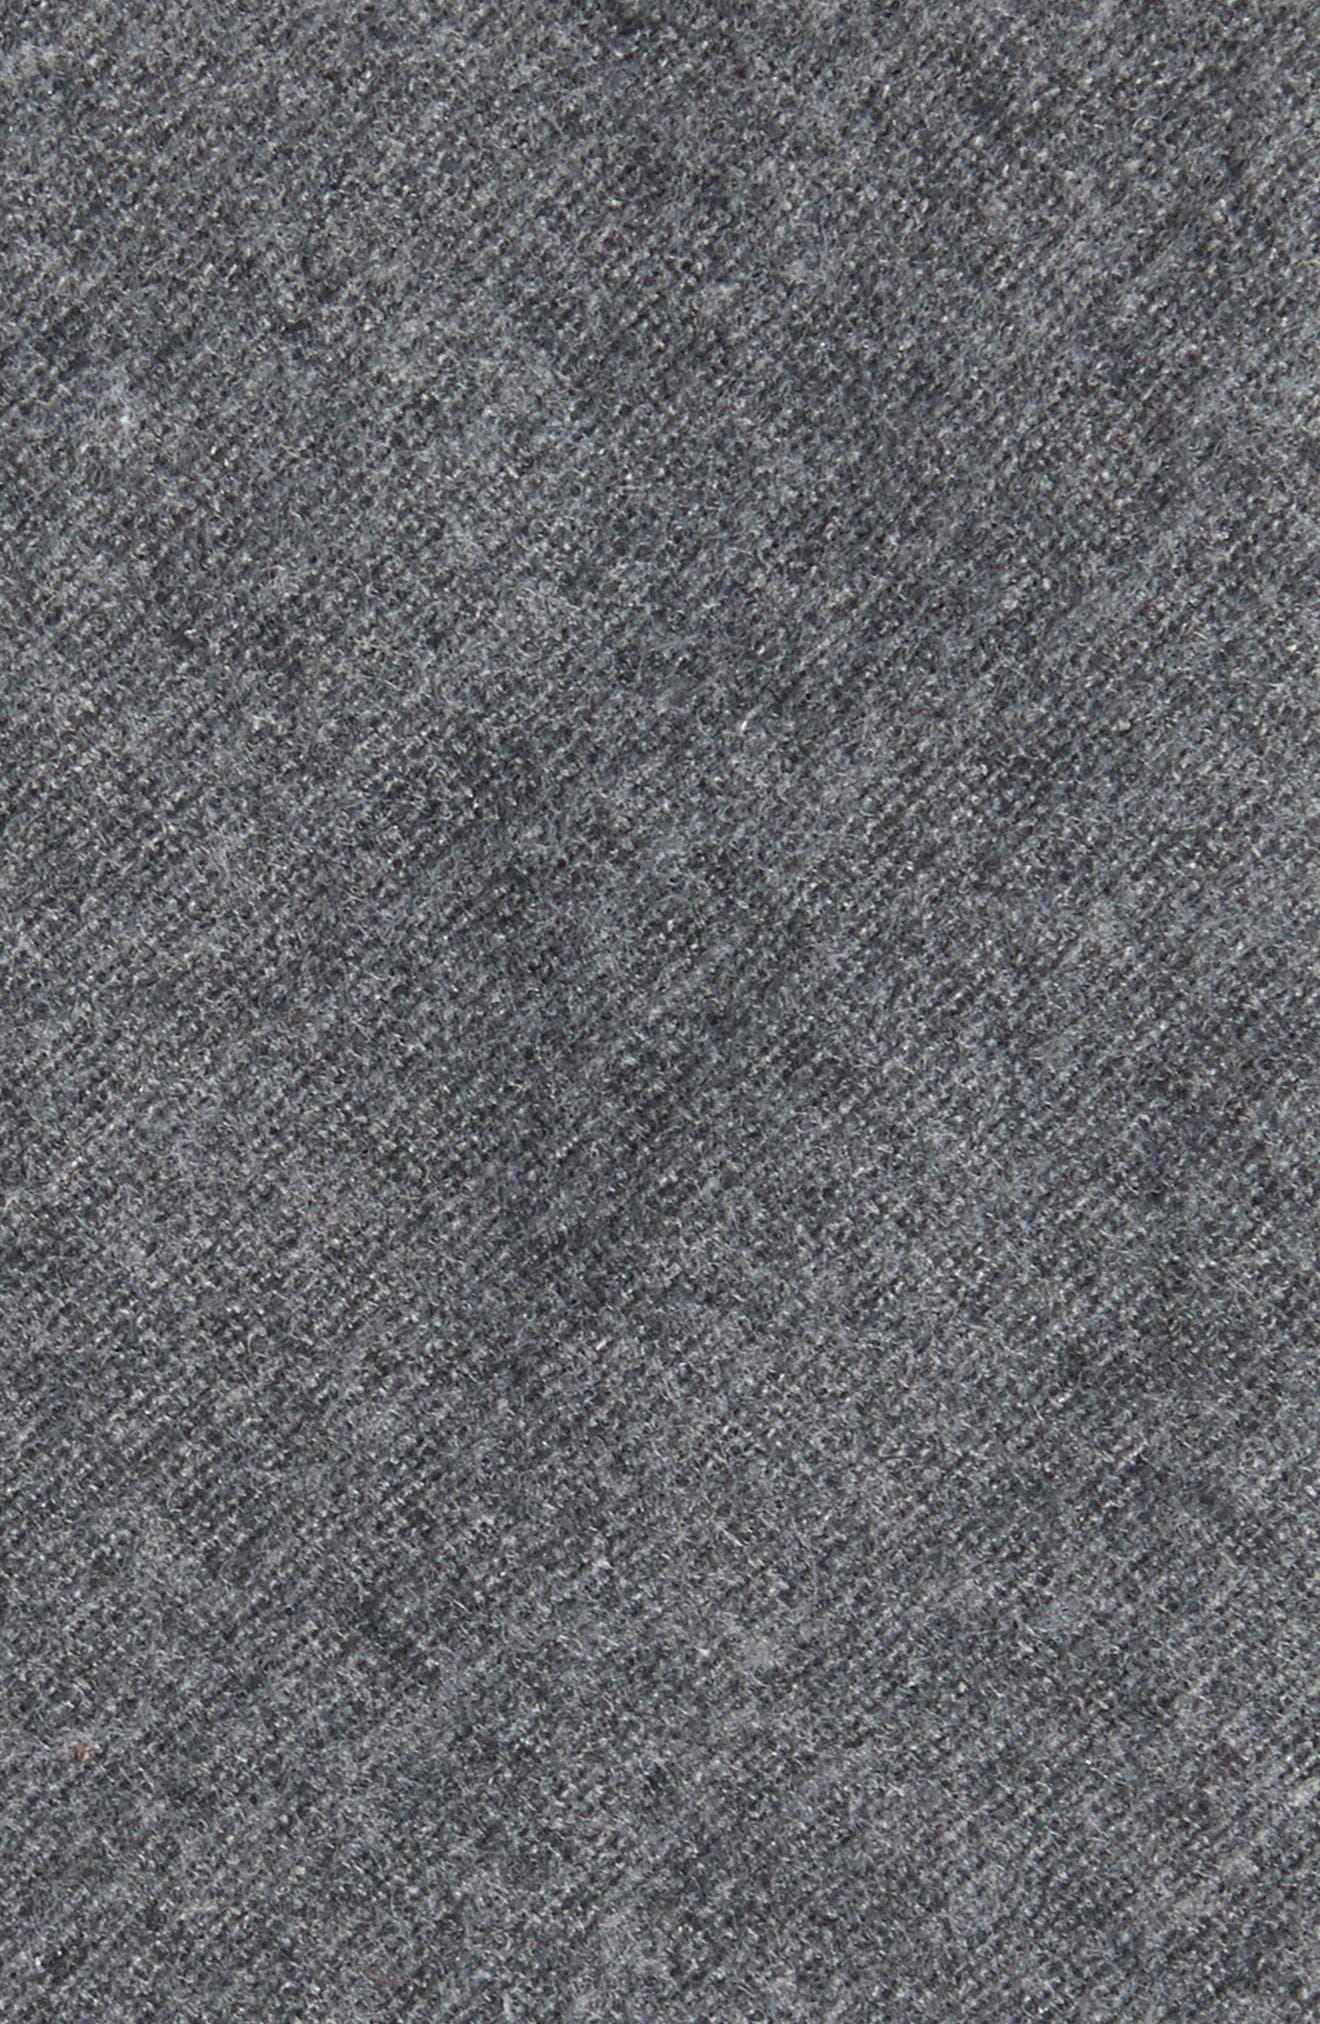 Bert Solid Cotton Skinny Tie,                             Alternate thumbnail 2, color,                             010